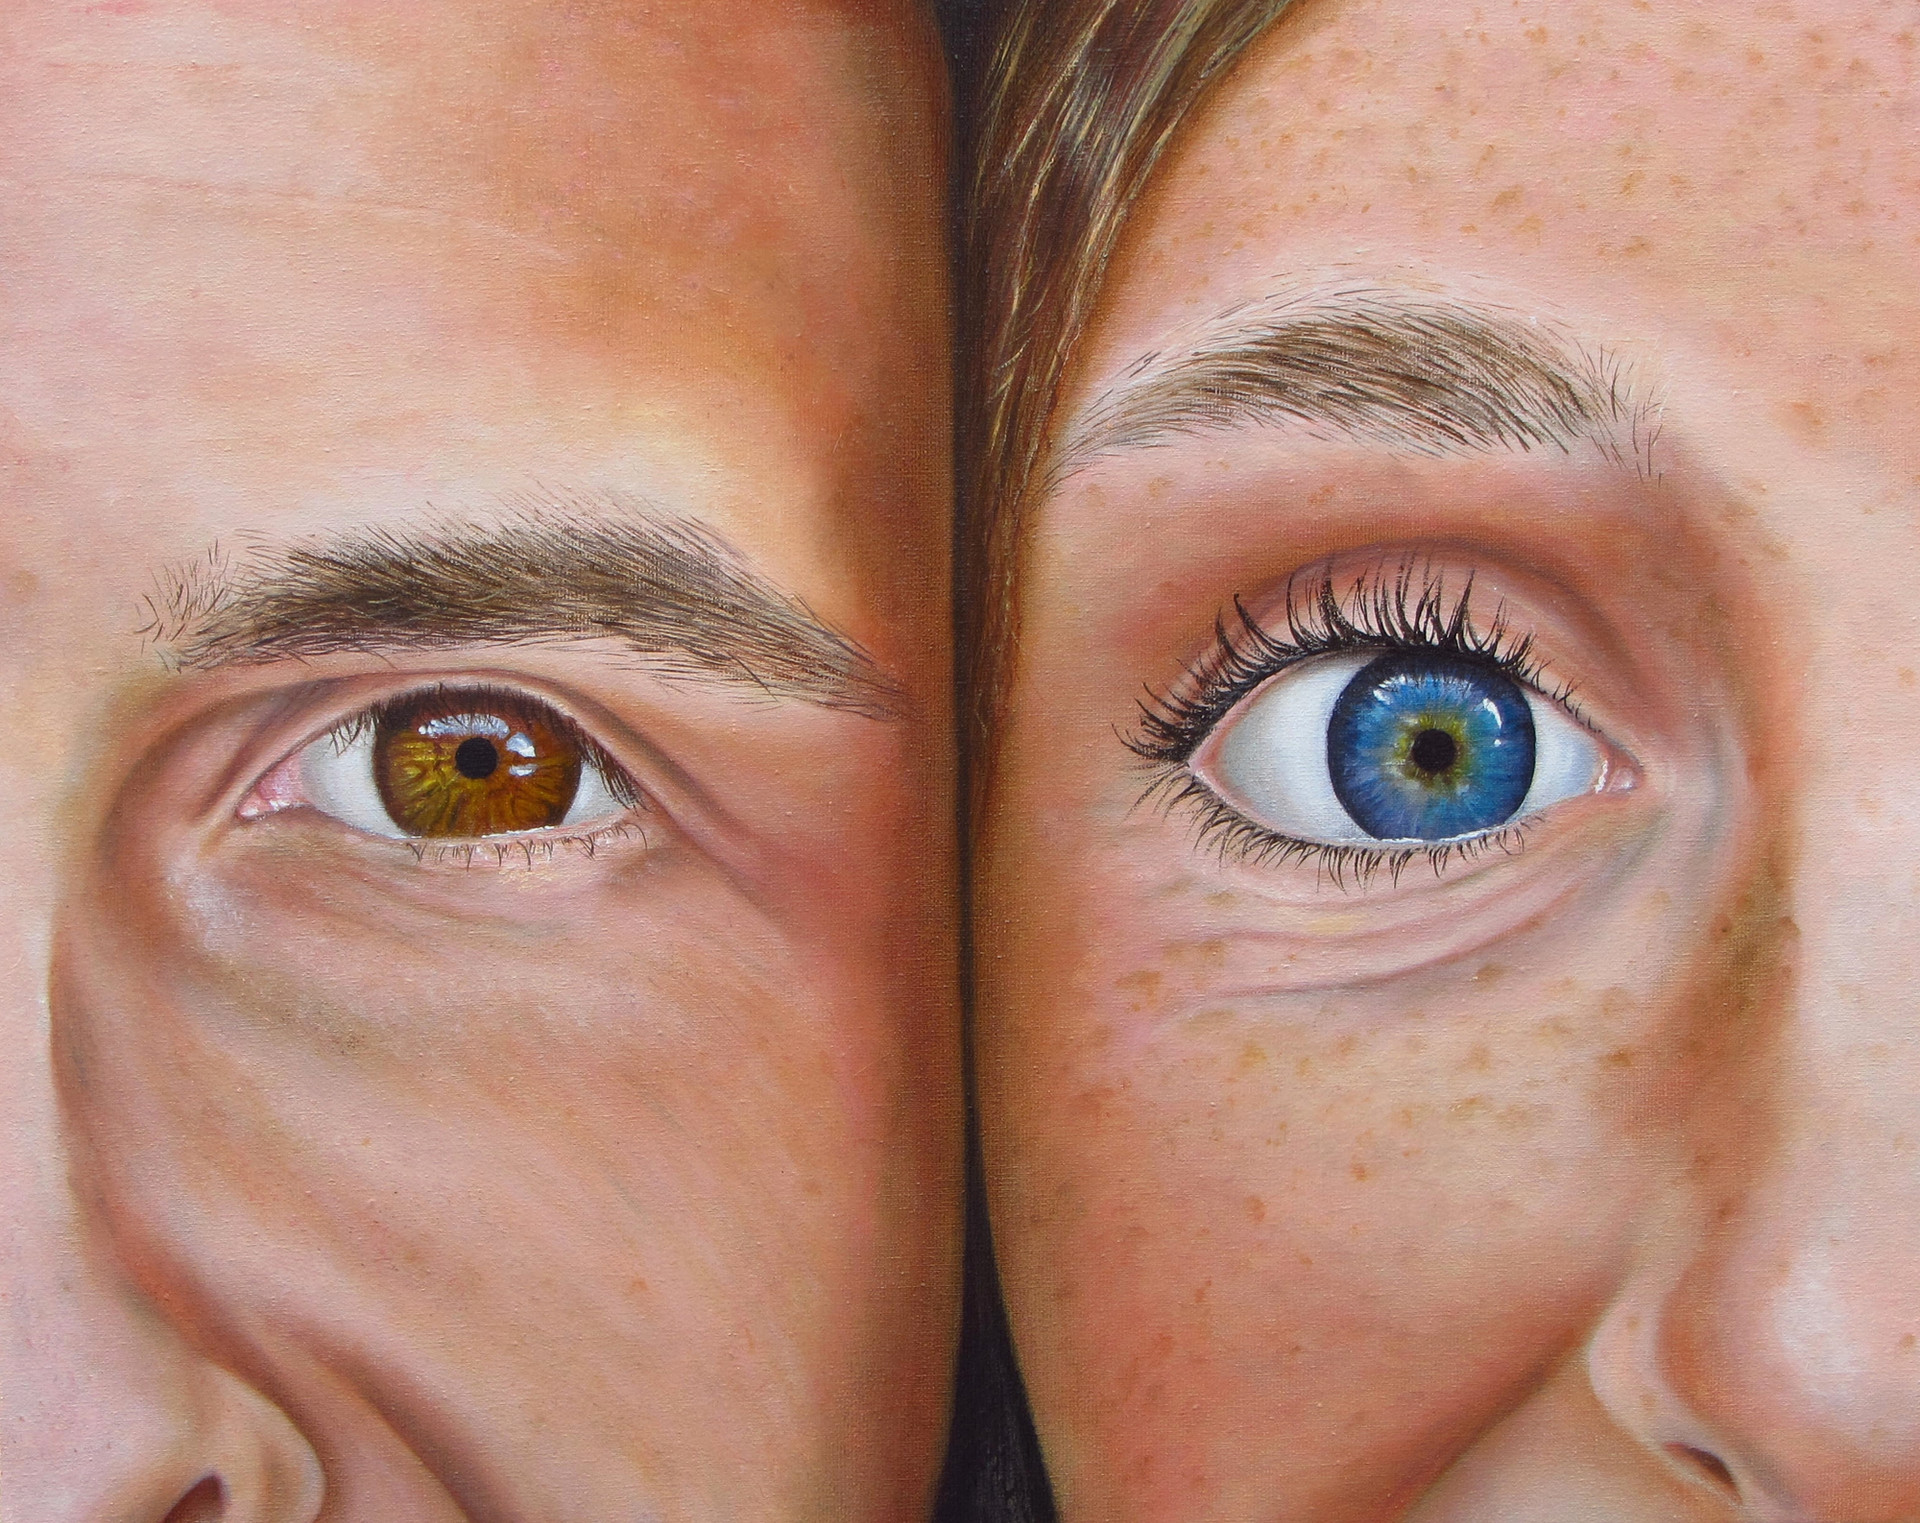 His blue-eyed girl